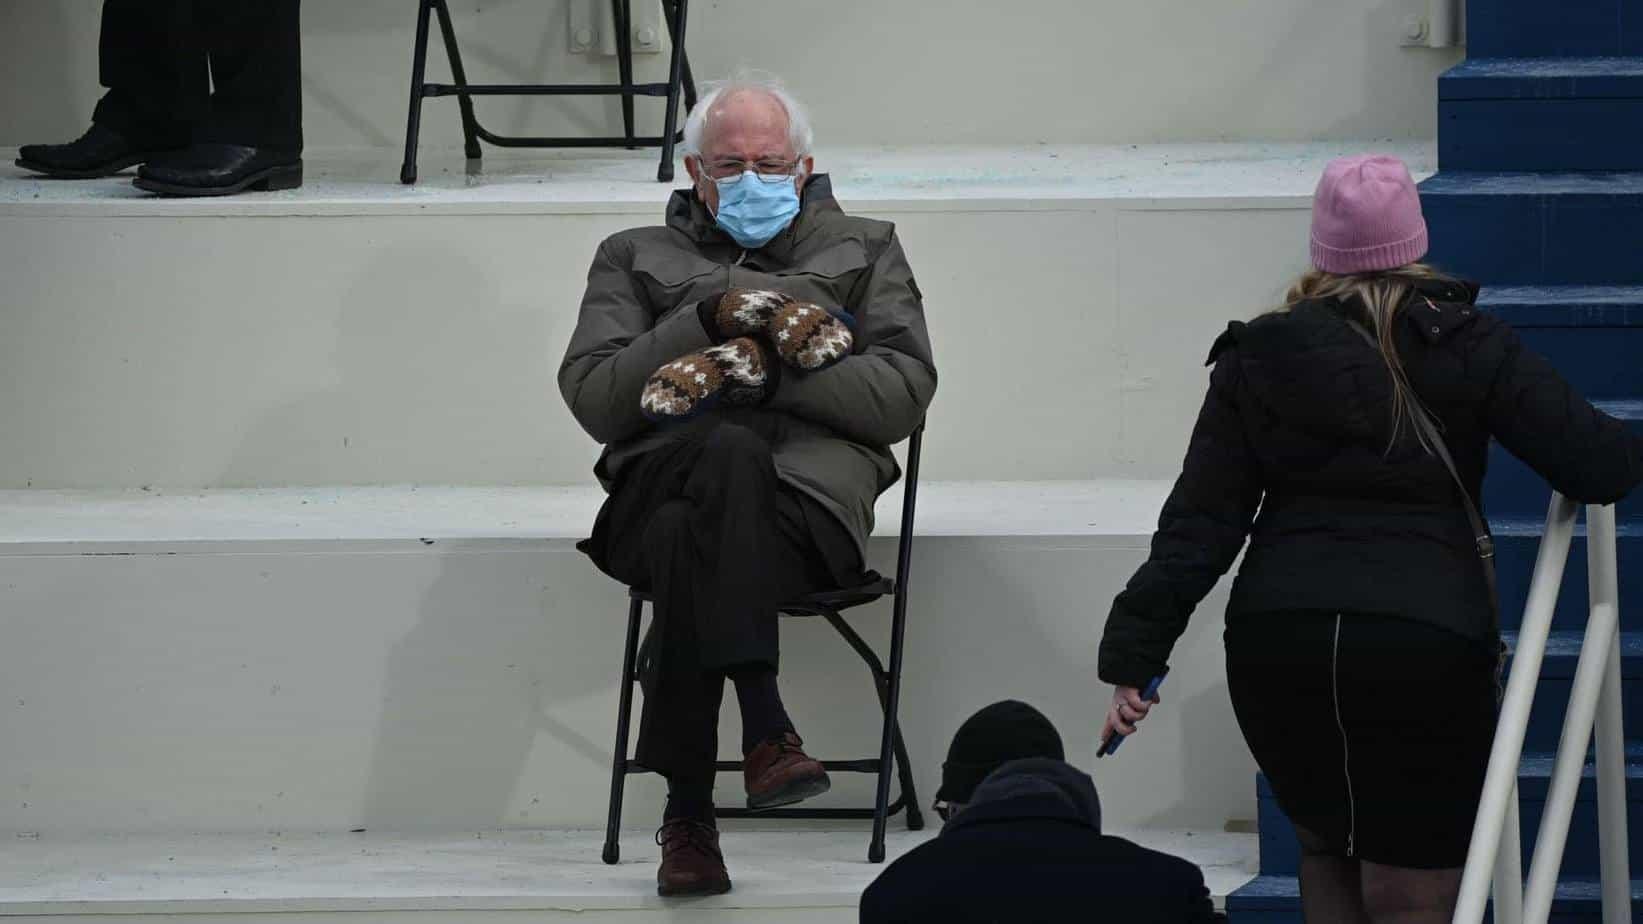 bernie inauguration memes mittens